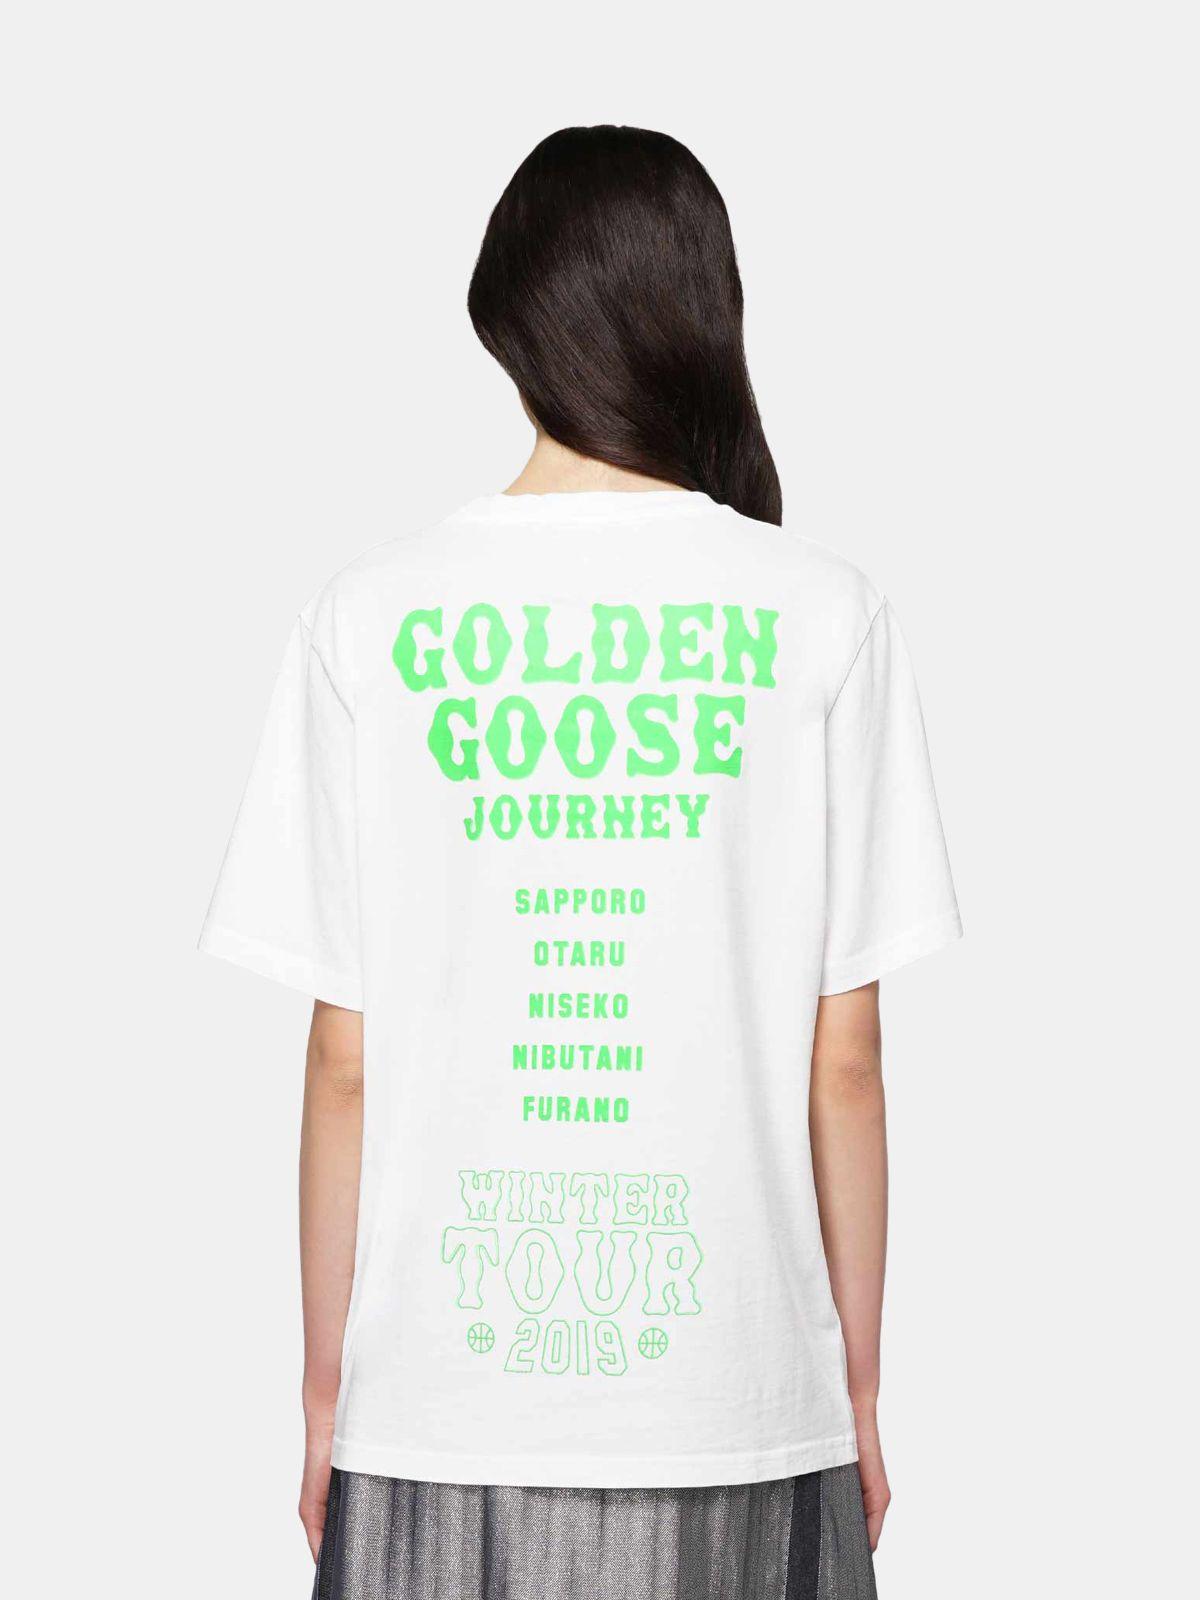 Golden Goose - Hokkaido Travel Guide T-shirt in